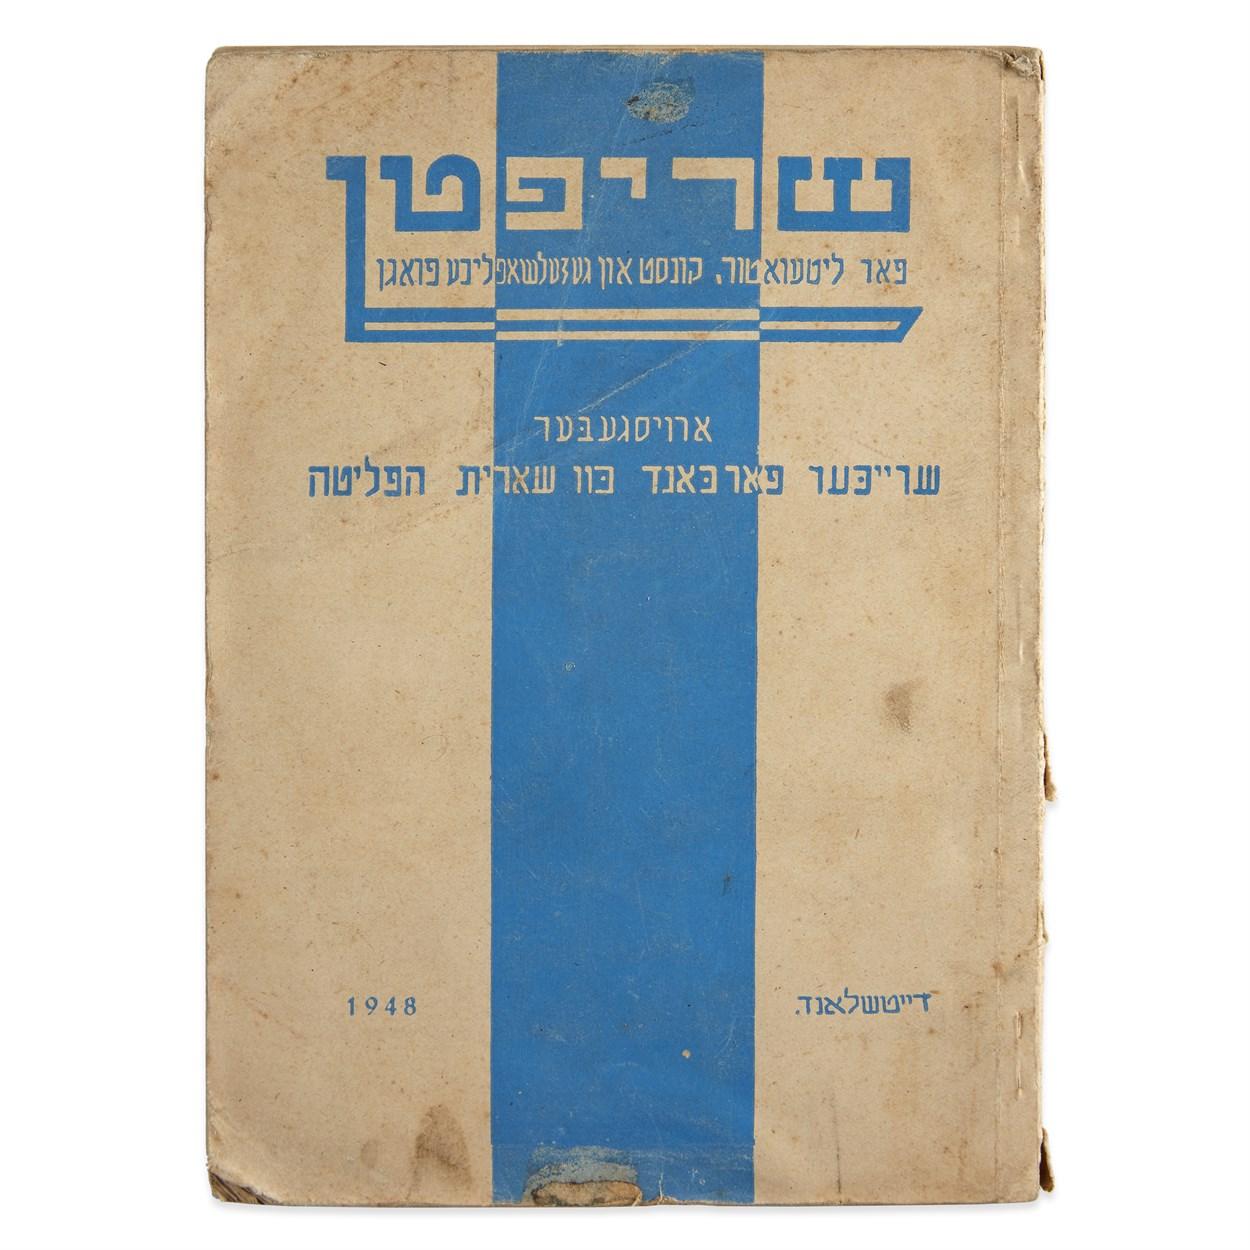 Lot 163 - [Judaica]